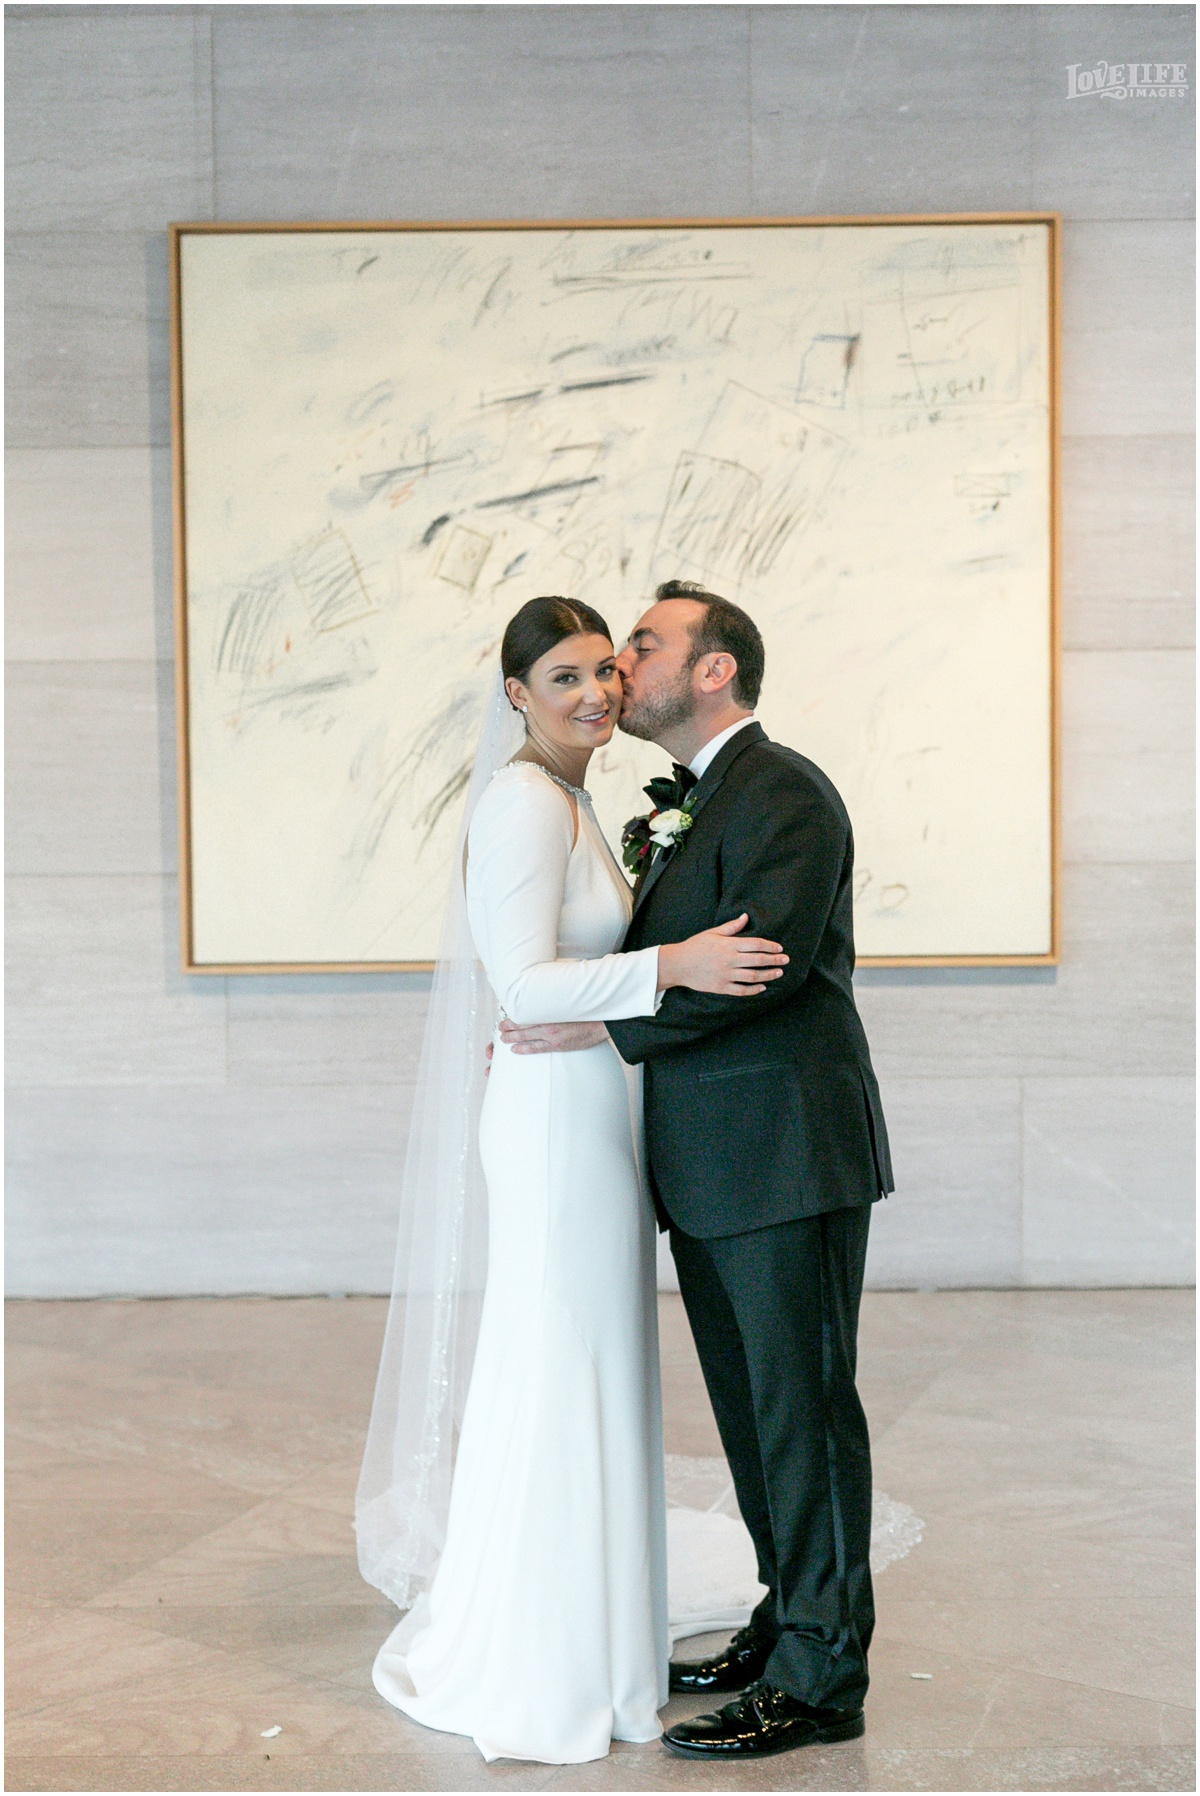 Winter District Winery Wedding bride and groom portrait.JPG